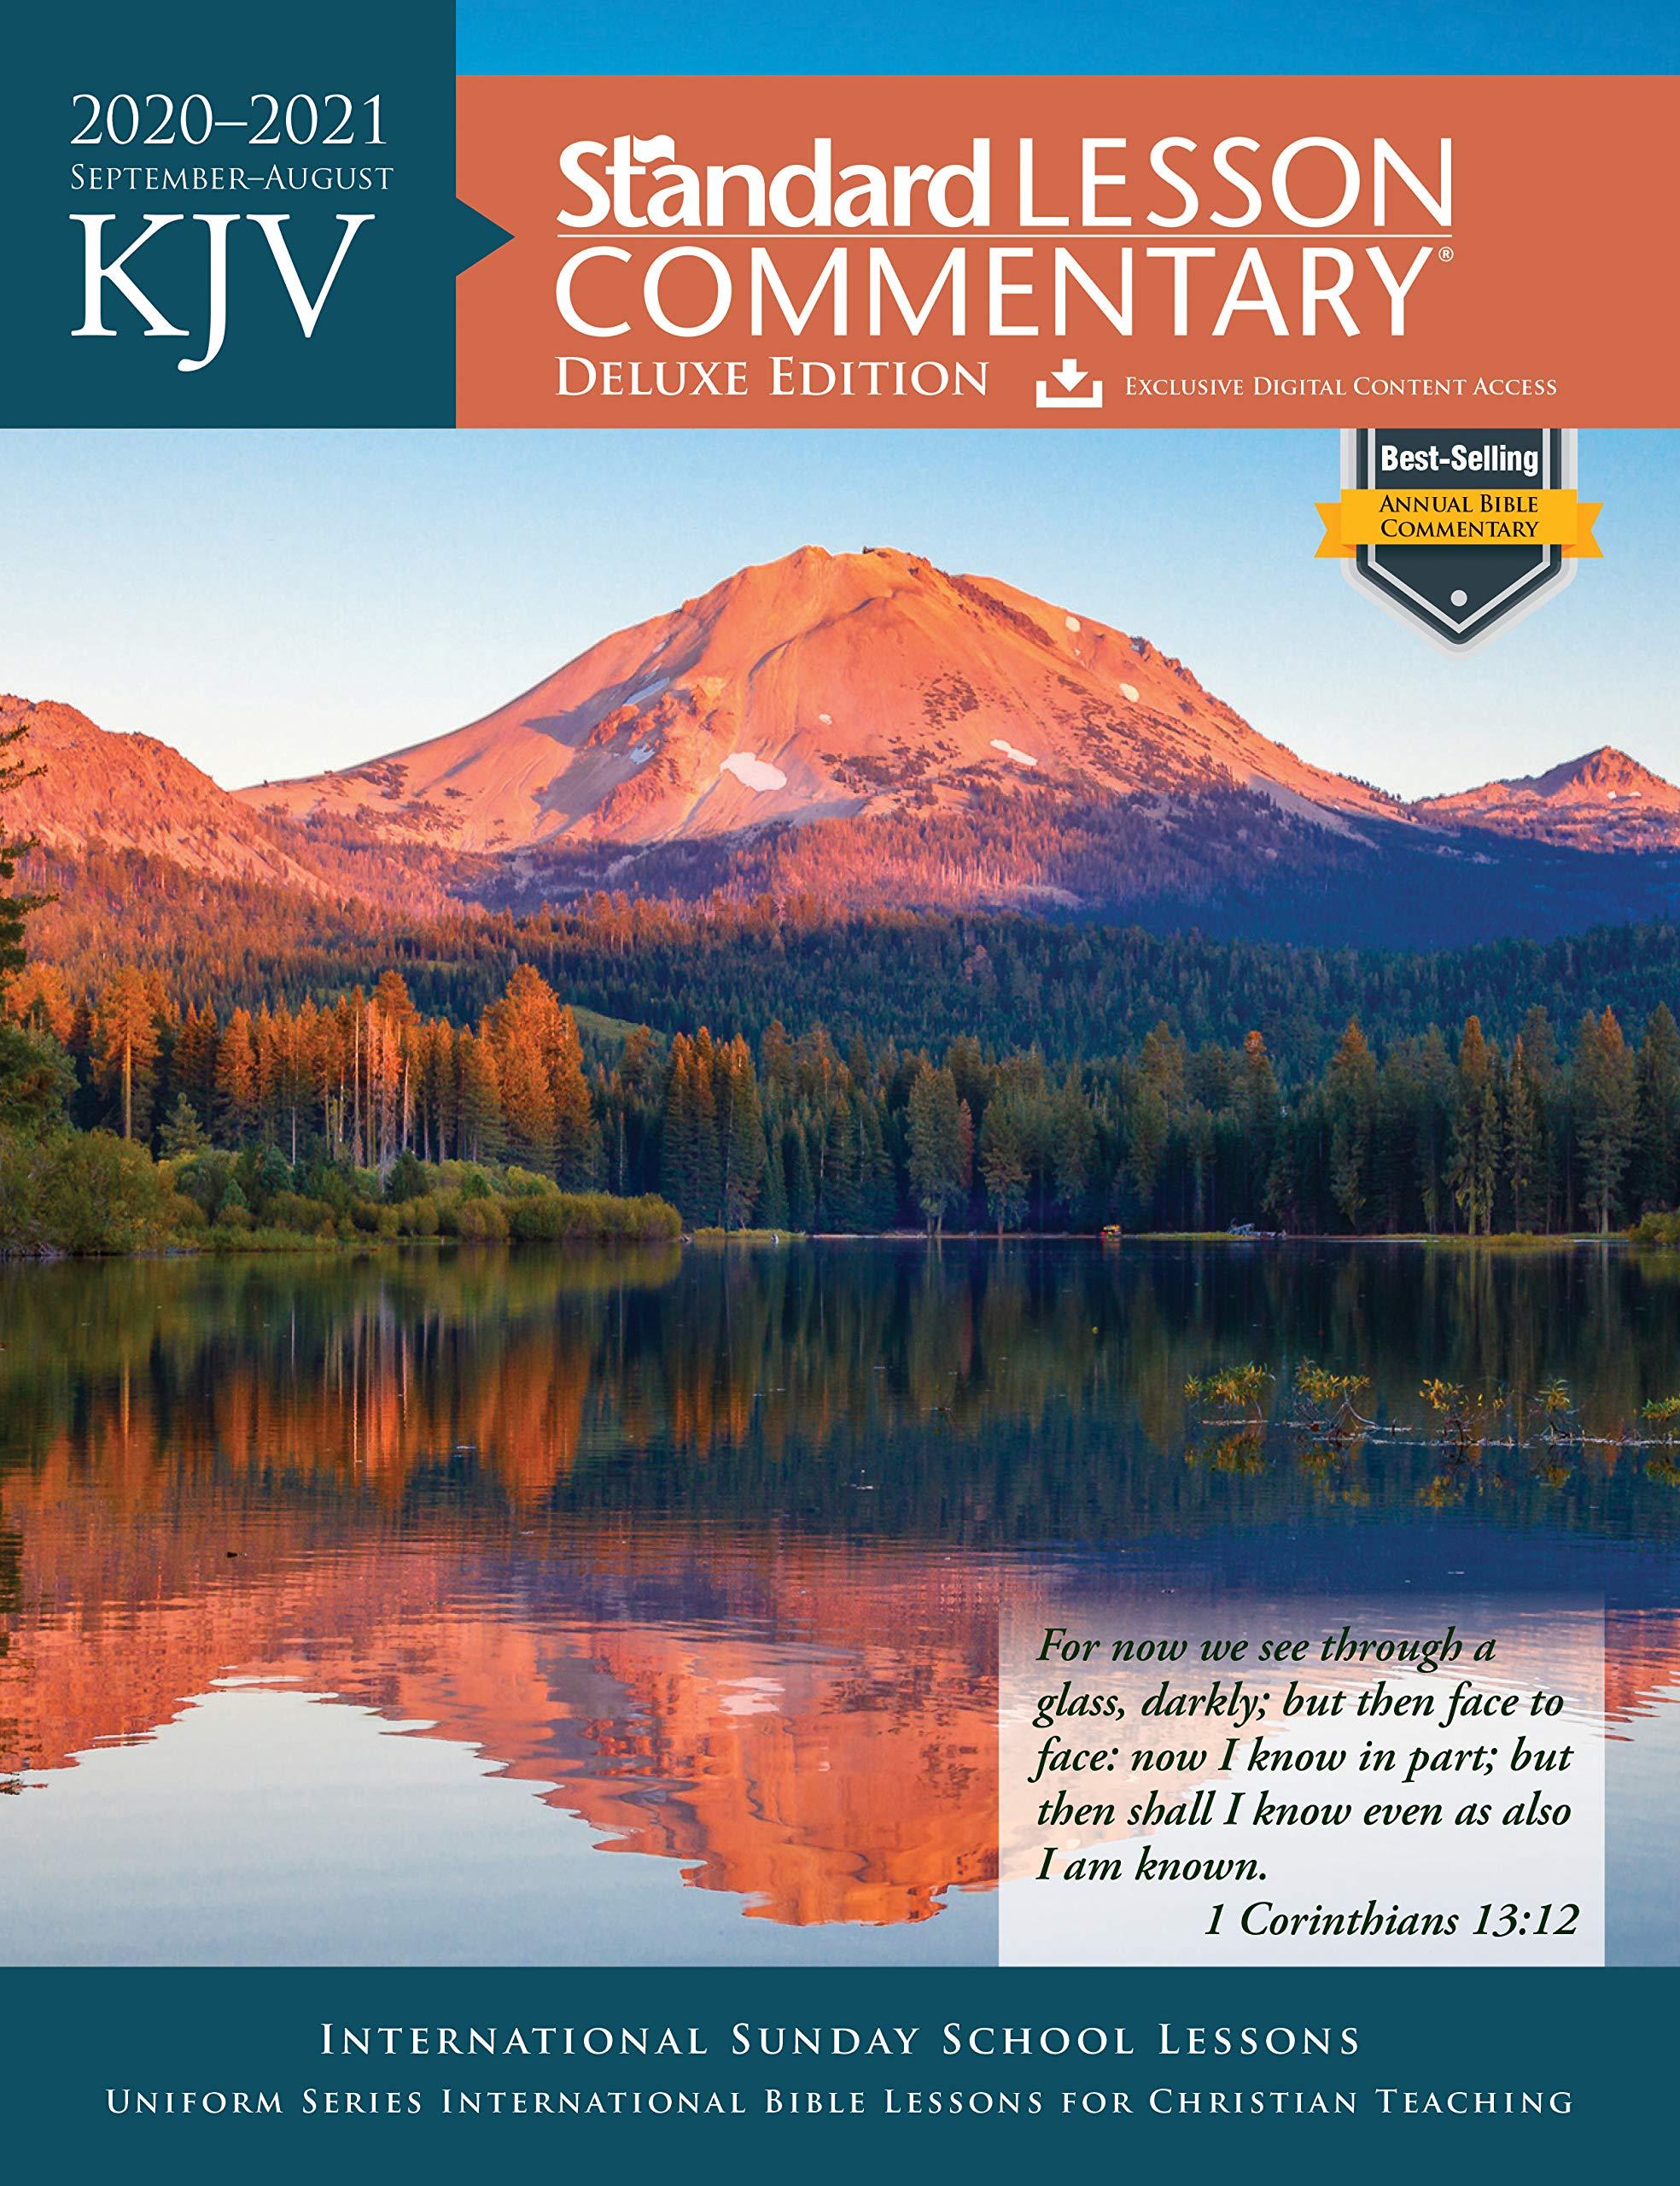 Best Study Bible 2021 KJV Standard Lesson Commentary® Deluxe Edition 2020 2021: Standard